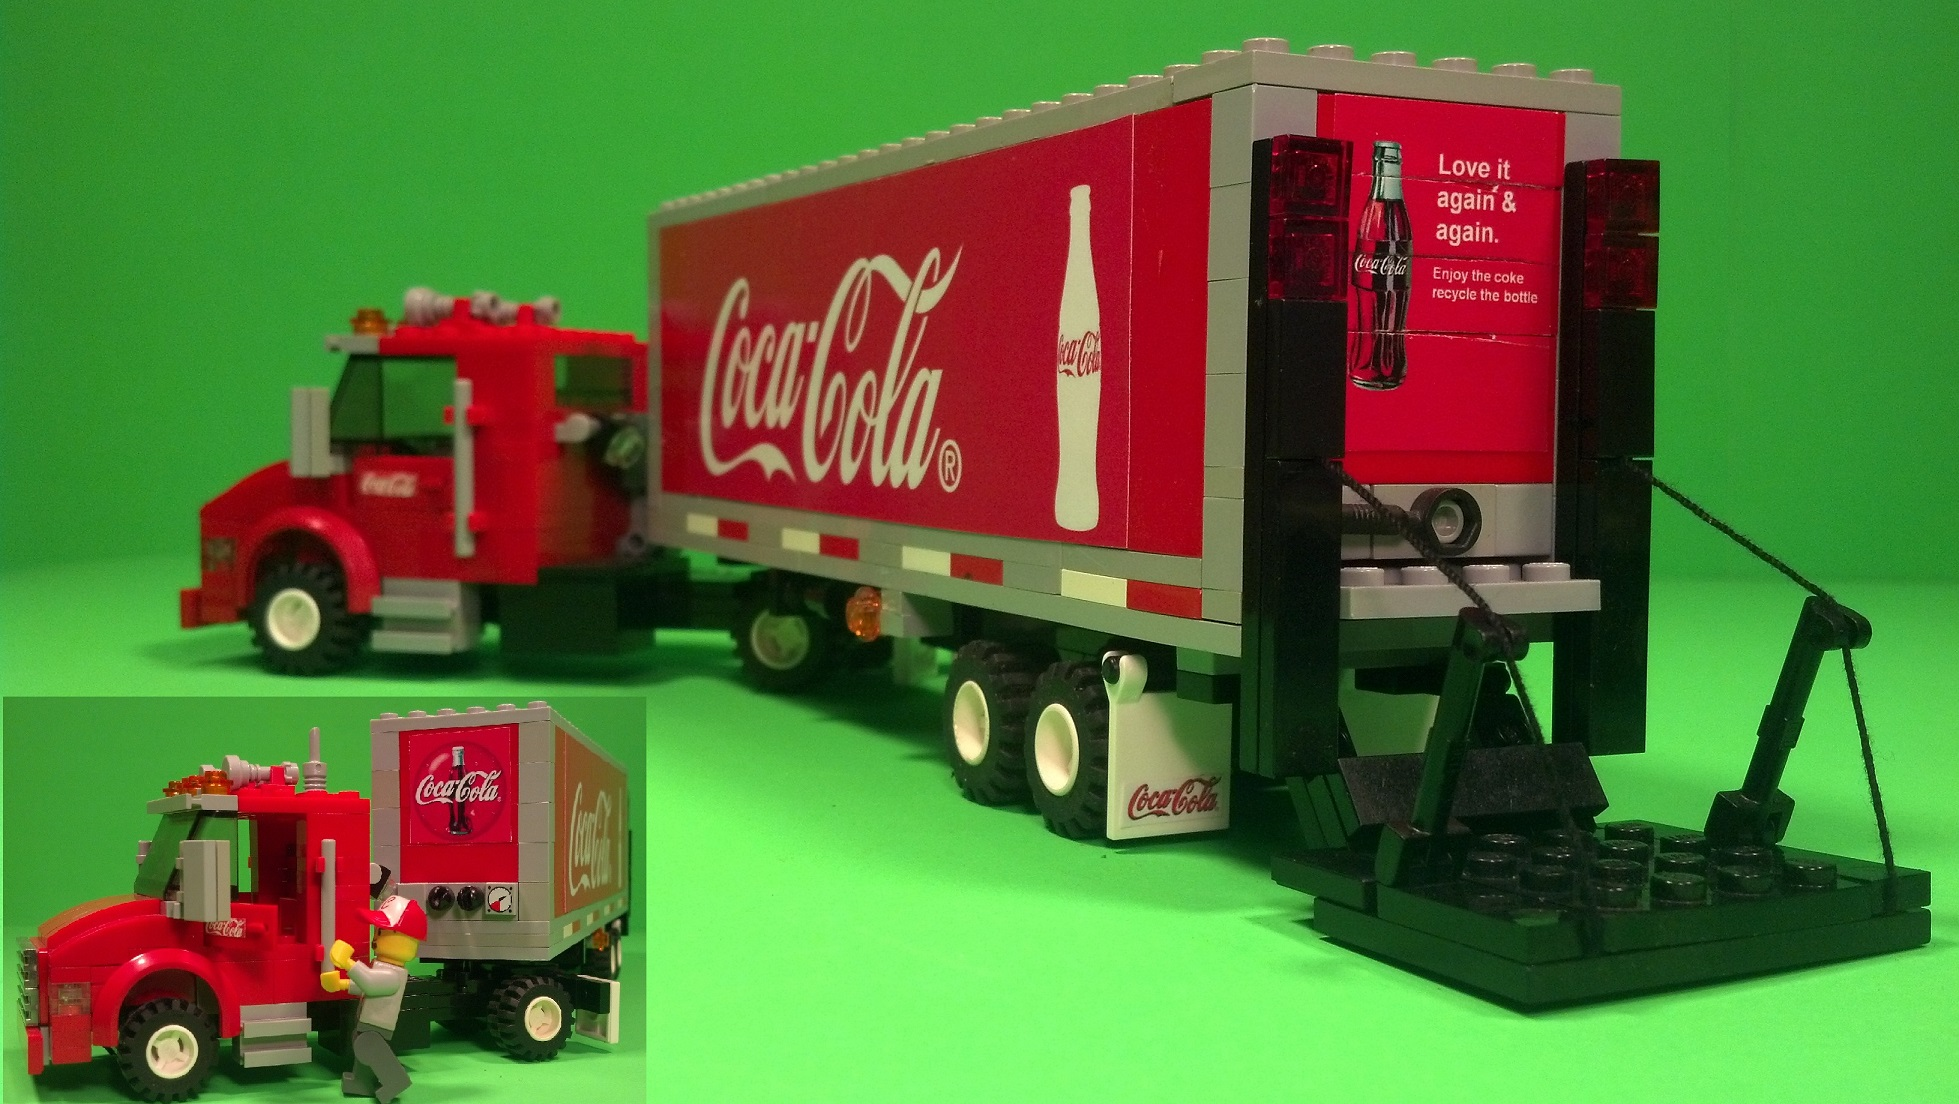 ACCESSORY Lego Coke Coca-Cola 6pk Official//Genuine Lego NEW Food